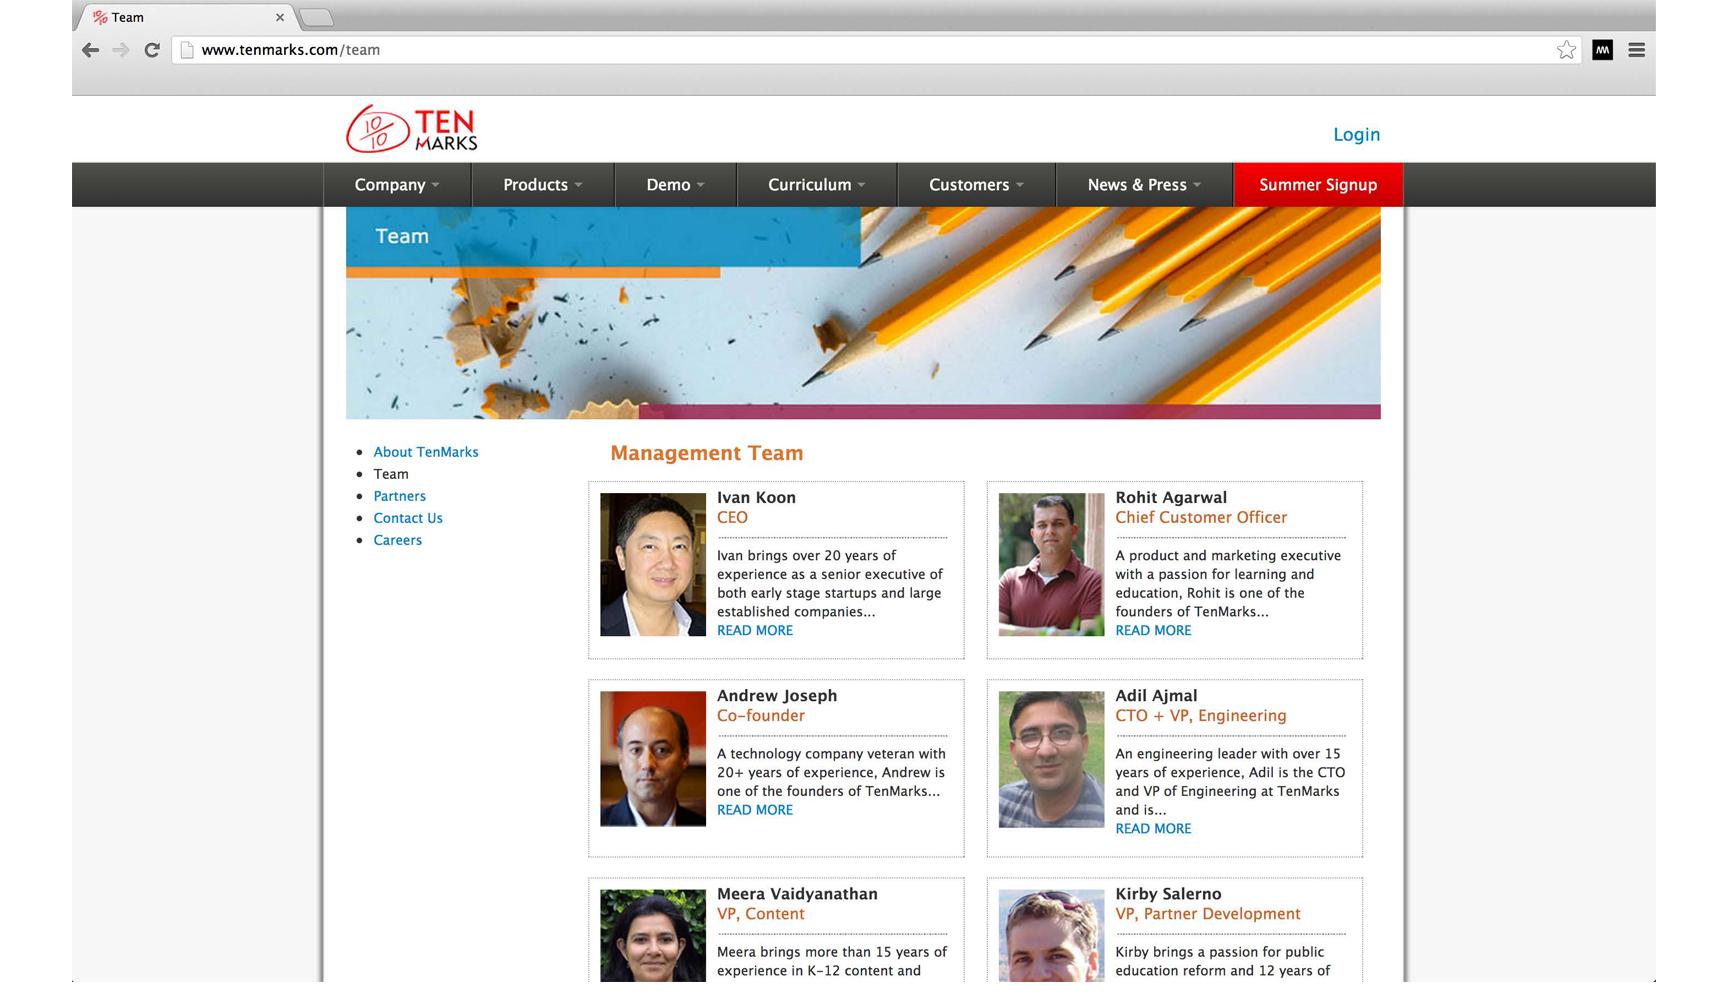 tenmarks_website_2.jpg